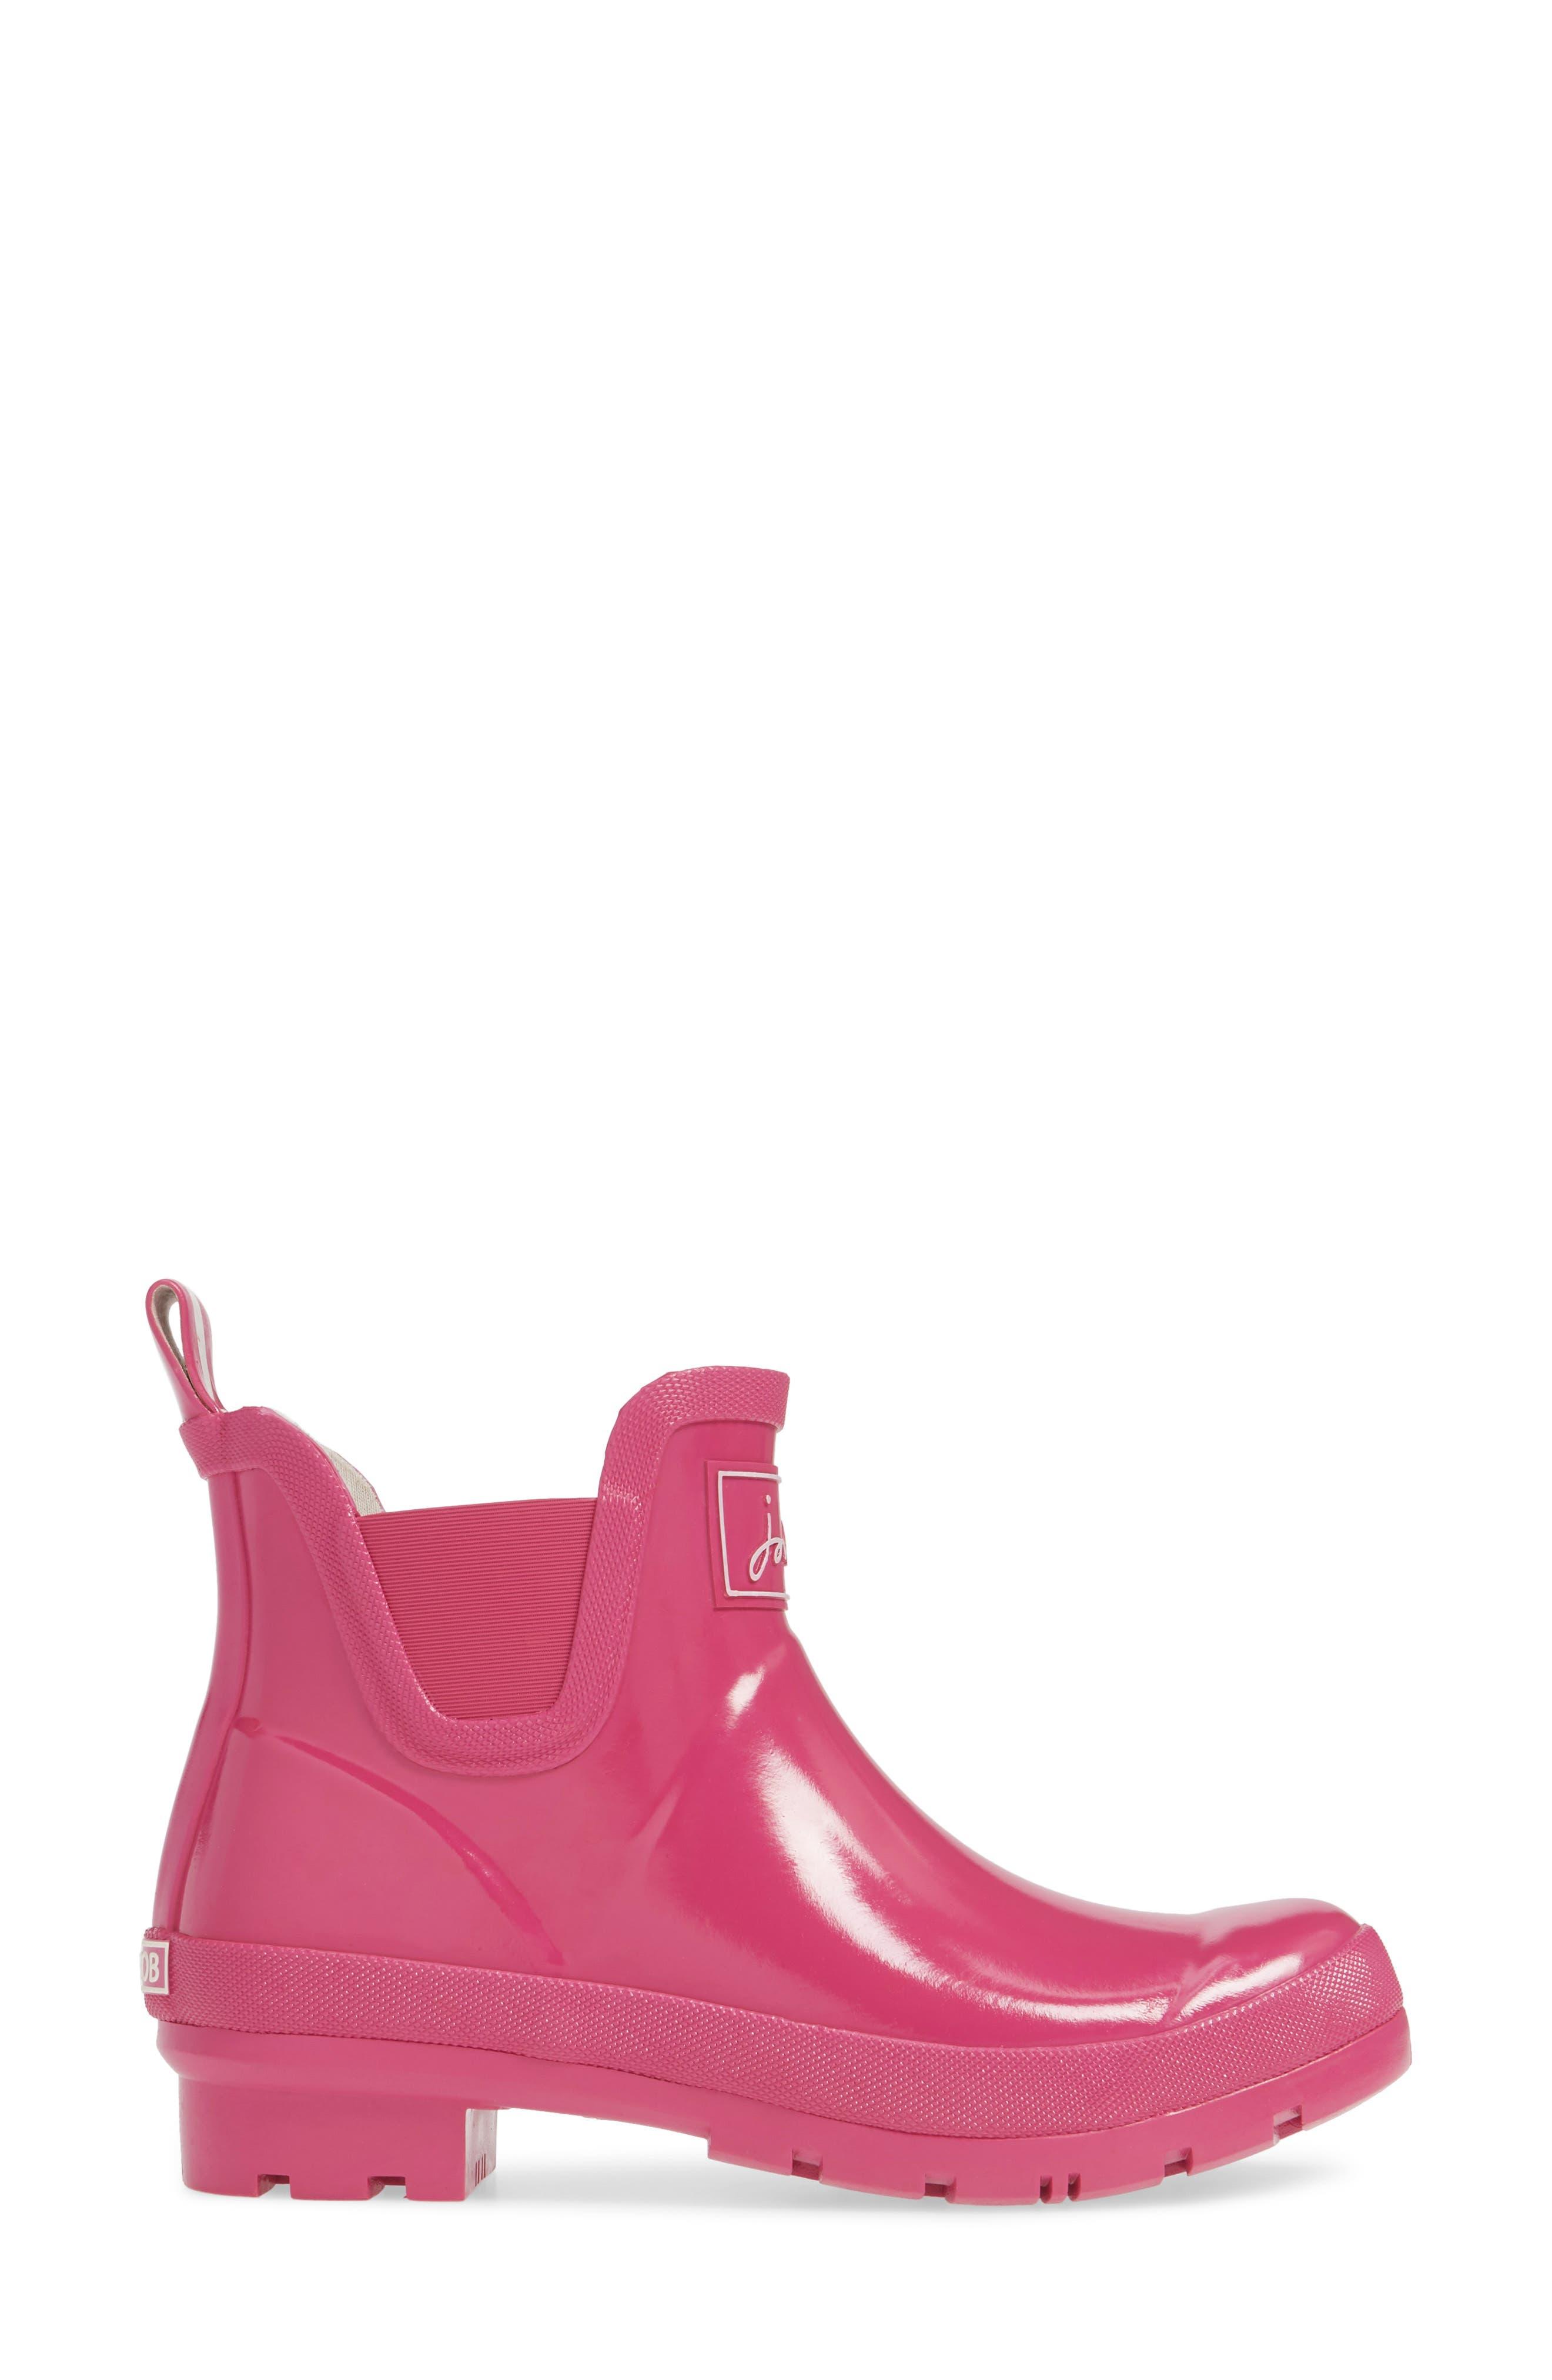 JOULES, Wellibob Short Rain Boot, Alternate thumbnail 3, color, PINK/ PINK